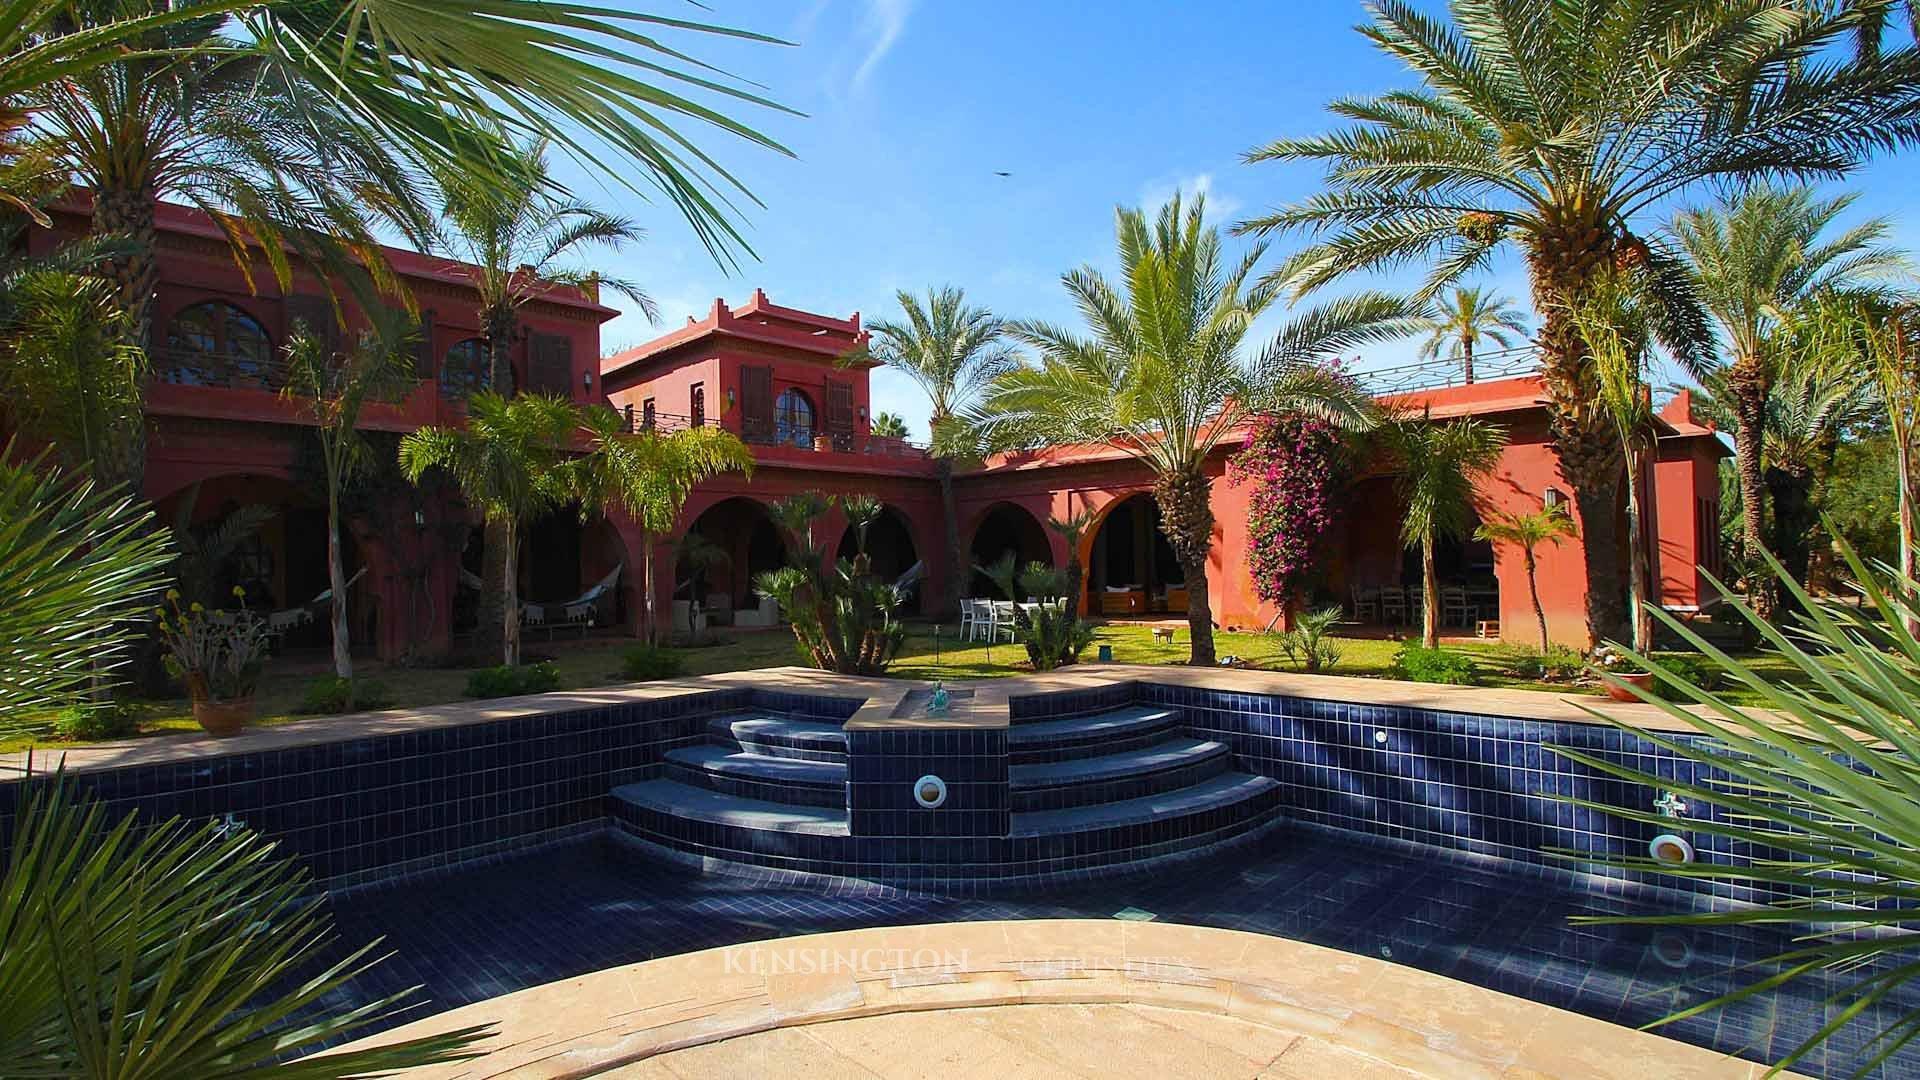 KPPM01184: Villa Essa Luxury Villa Marrakech Morocco